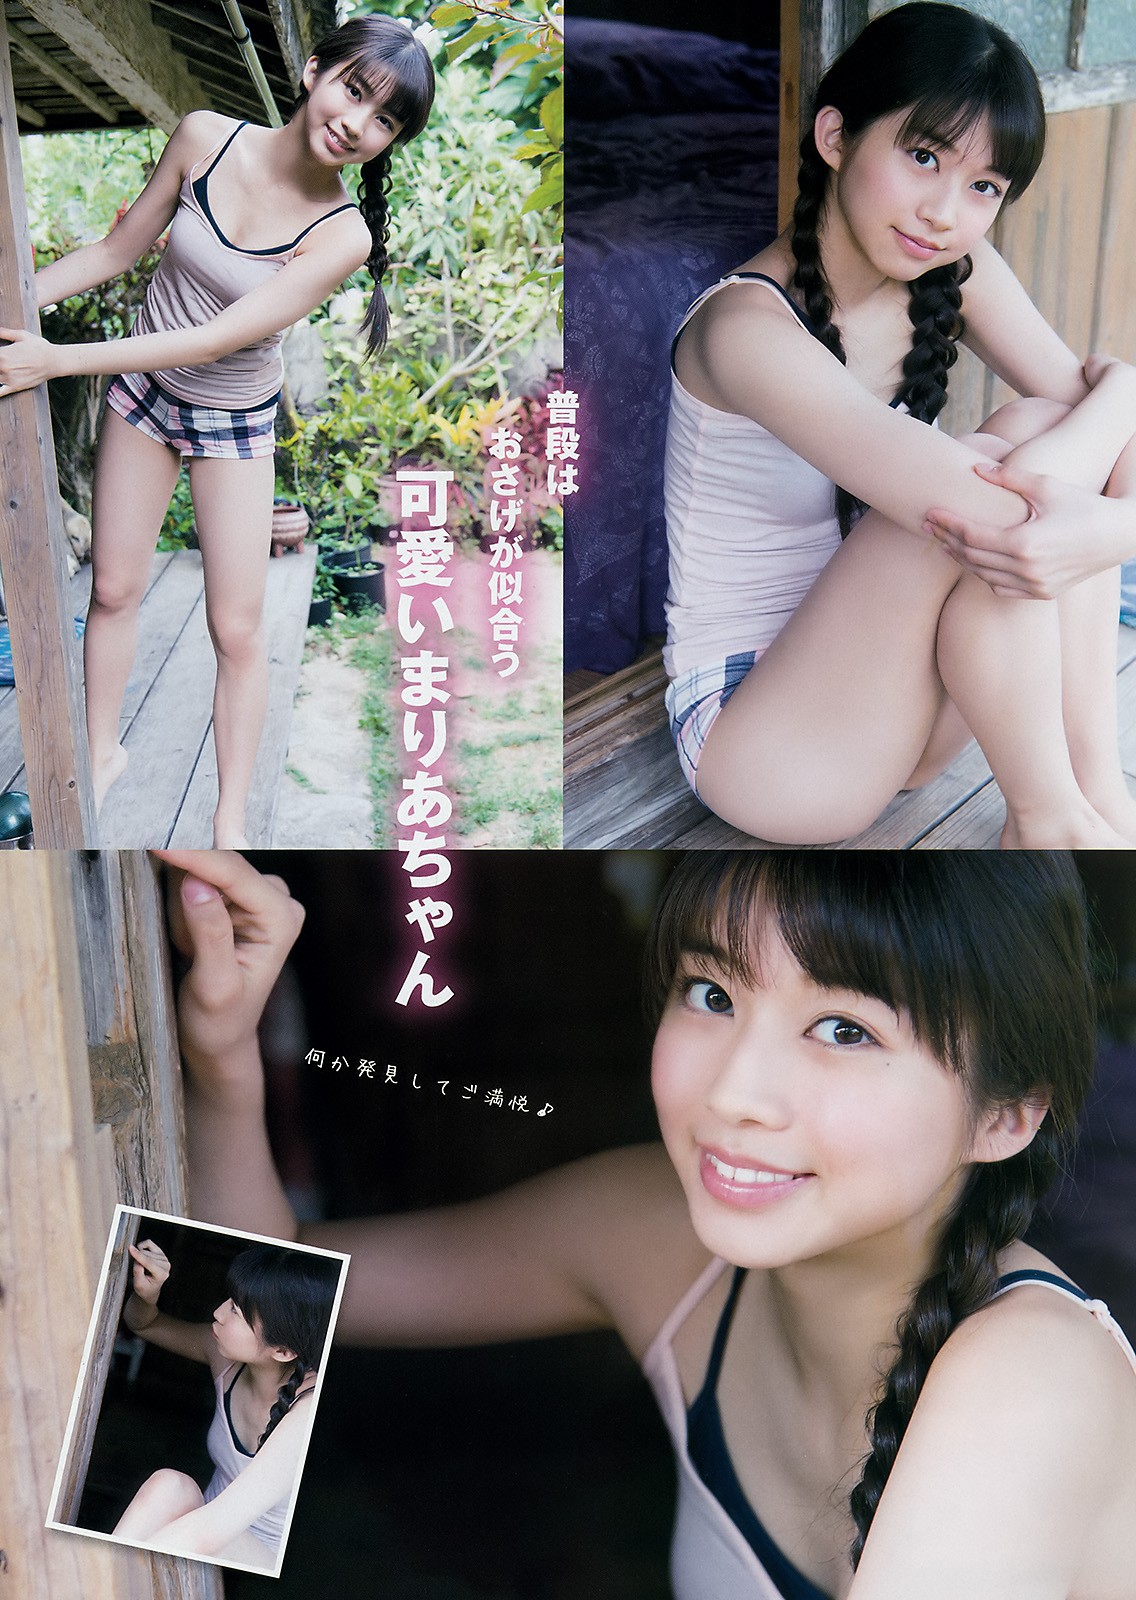 Makino Maria 牧野真莉愛 Morning Musume, Young Magazine 2017.06.12 No.26 (週刊ヤングマガジン 2017年26号)